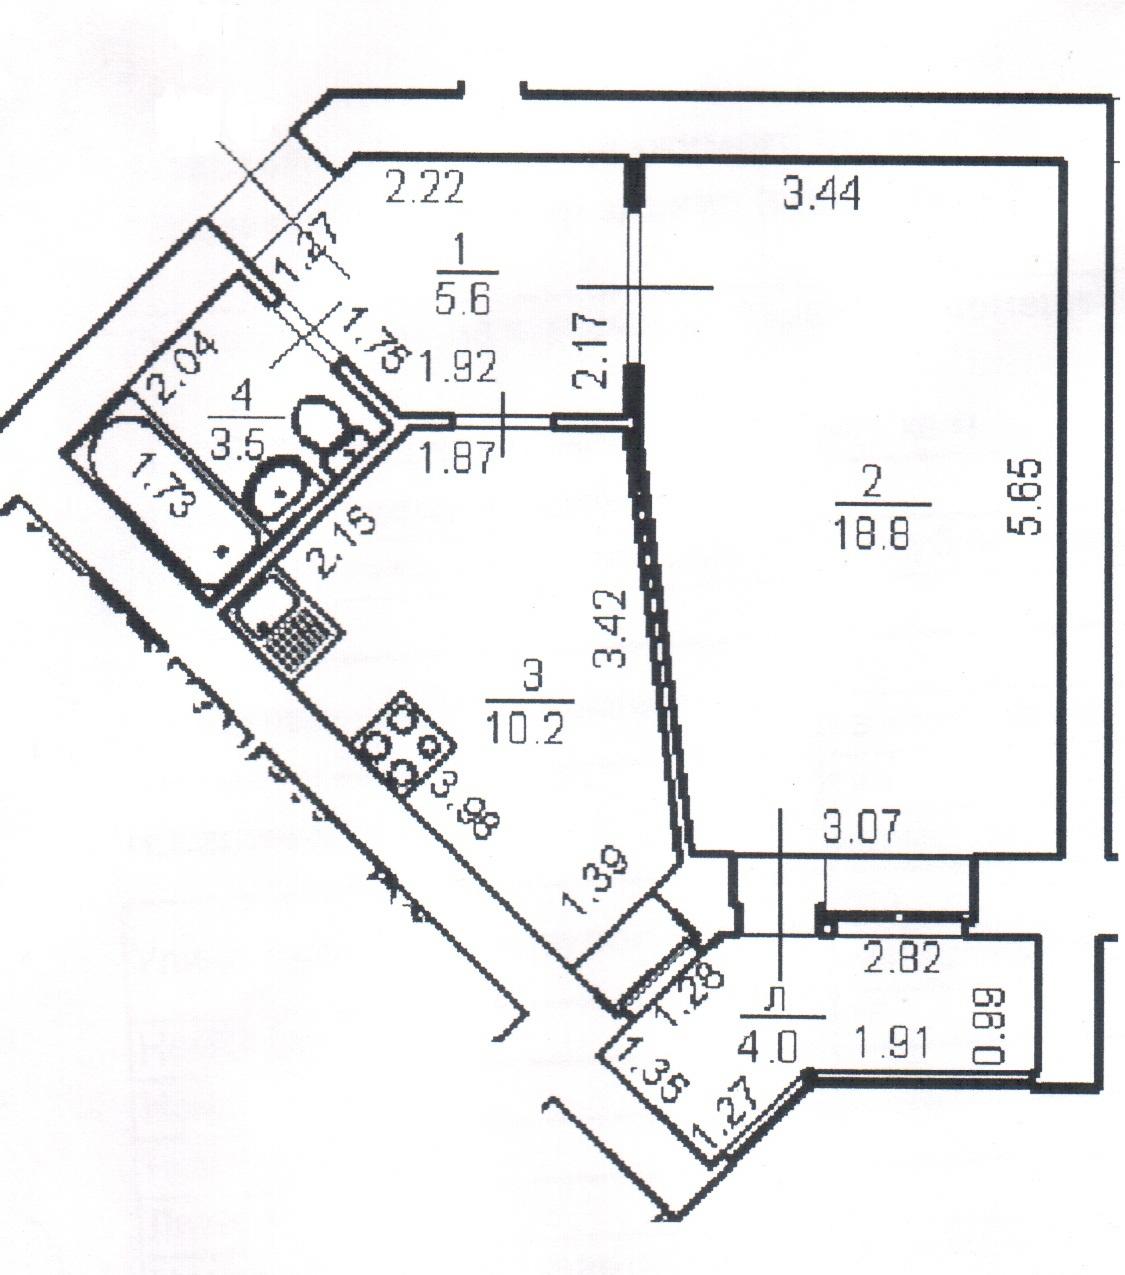 Однокомнатная квартира 40.1 кв.м.